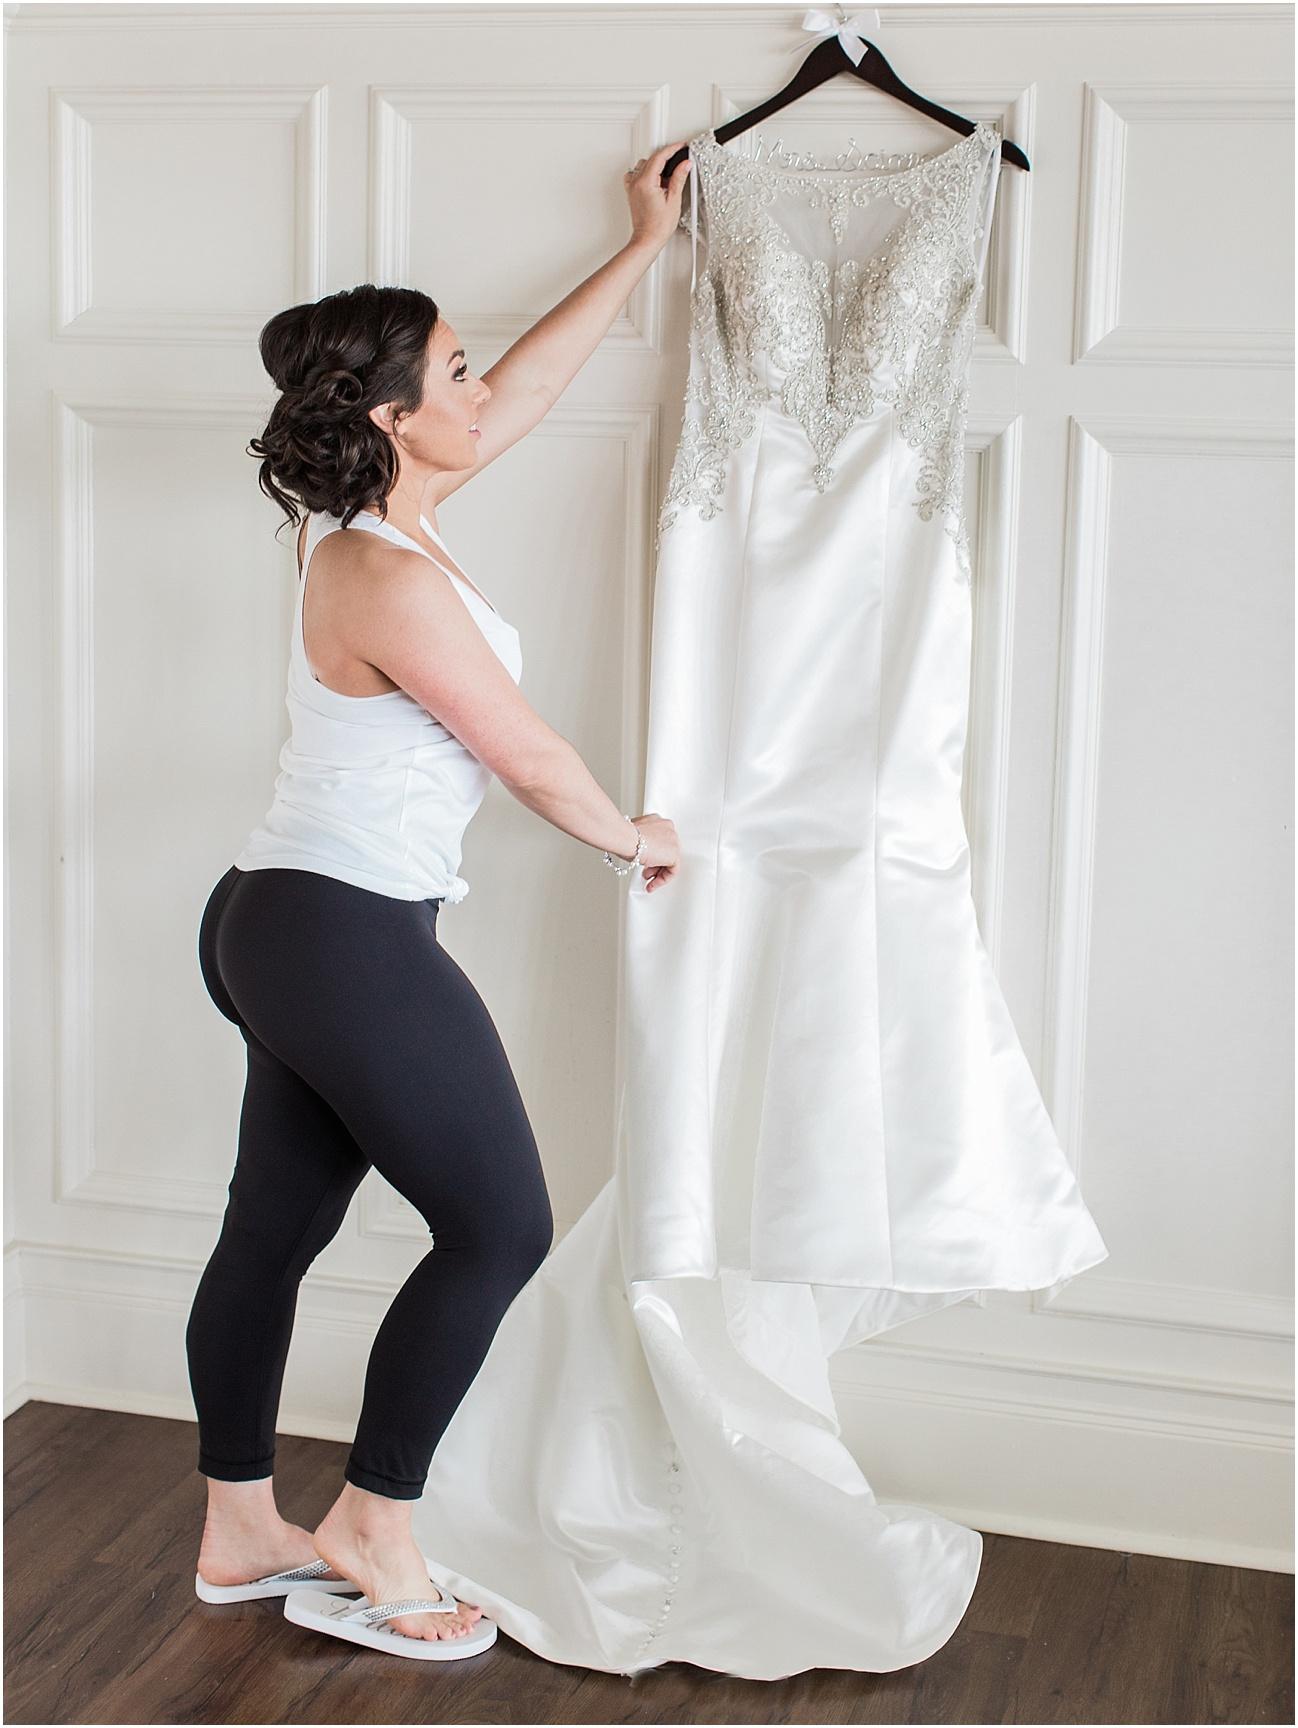 nicole_stephen_cape_club_nicky_falmouth_cod_boston_wedding_photographer_meredith_jane_photography_photo_0203.jpg